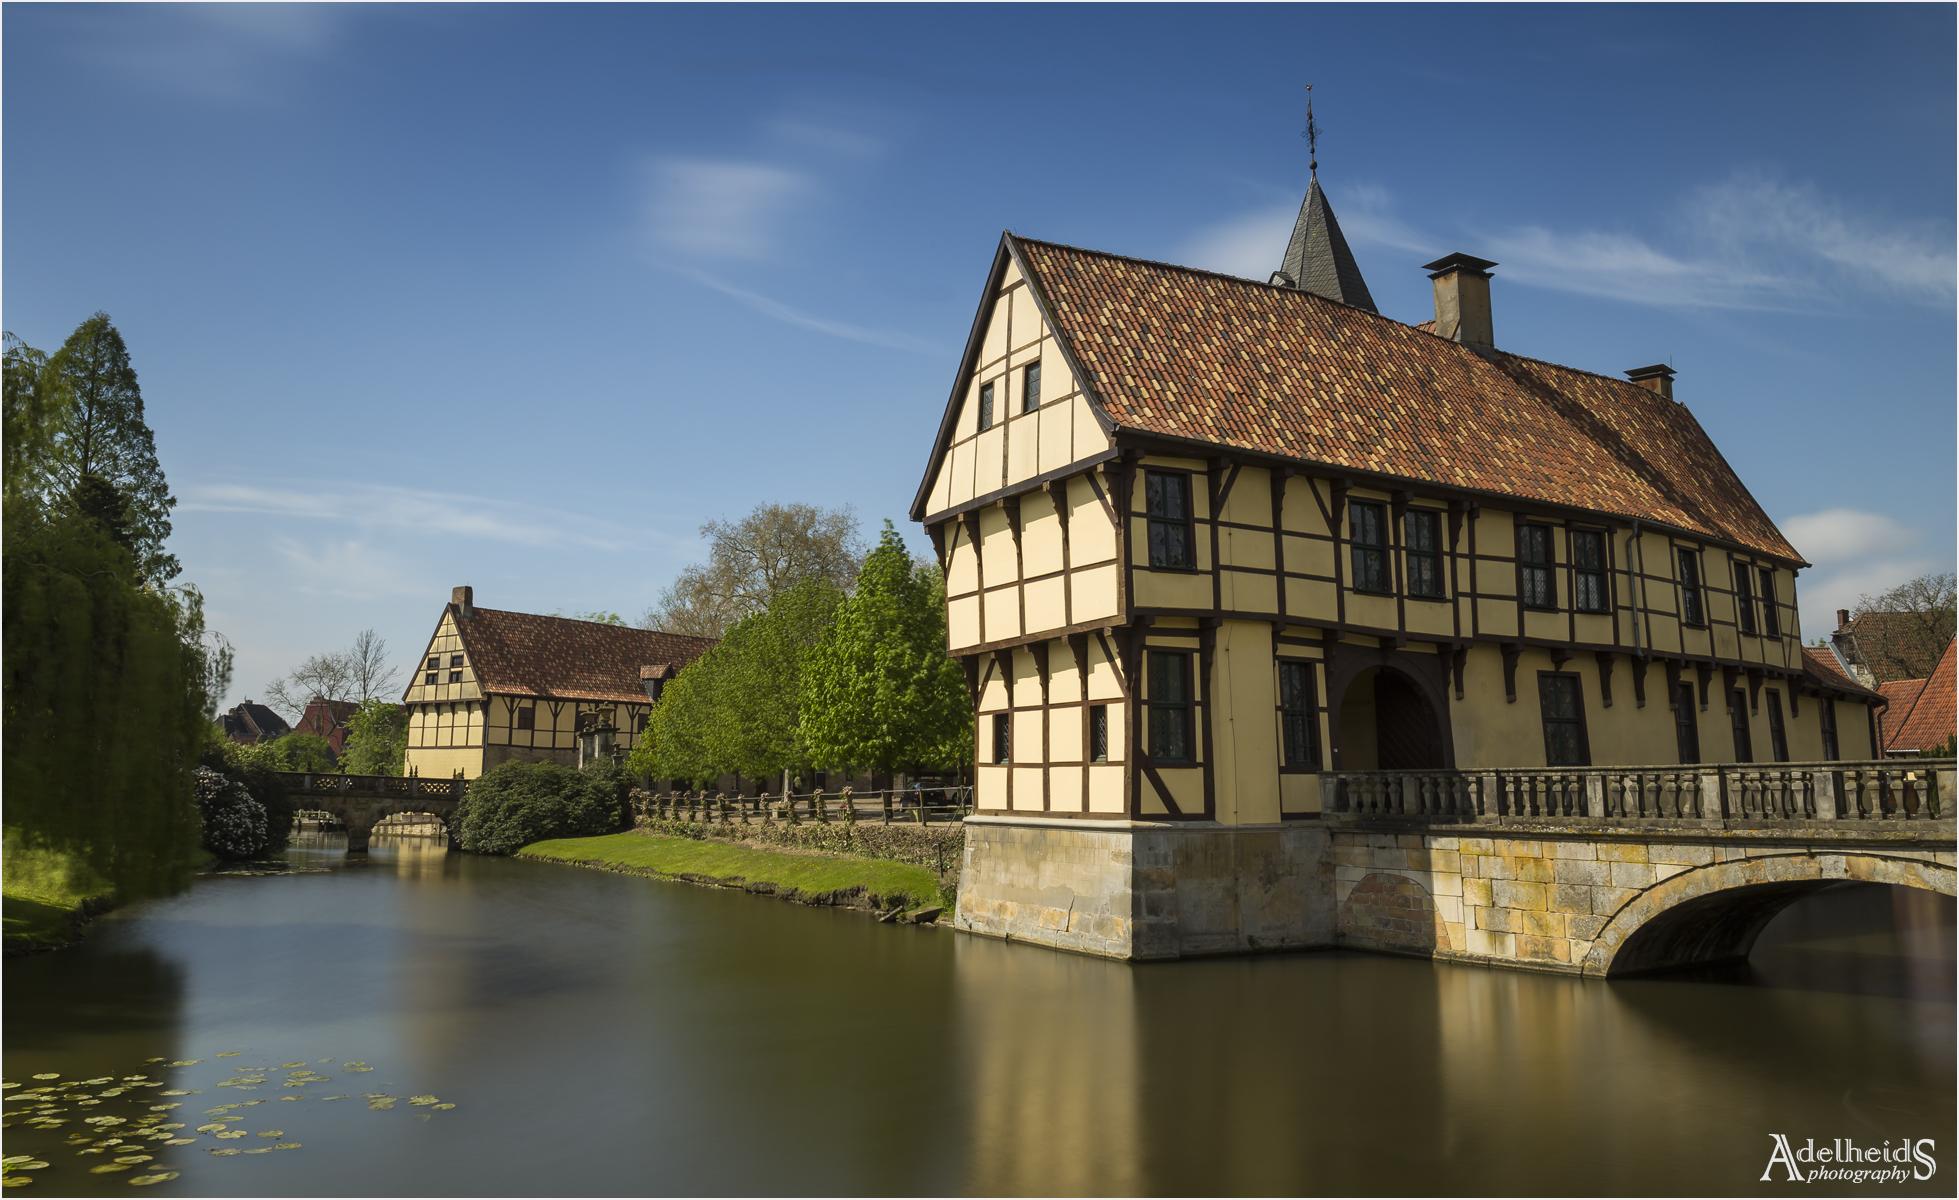 Steinfurt Schloss, Germany